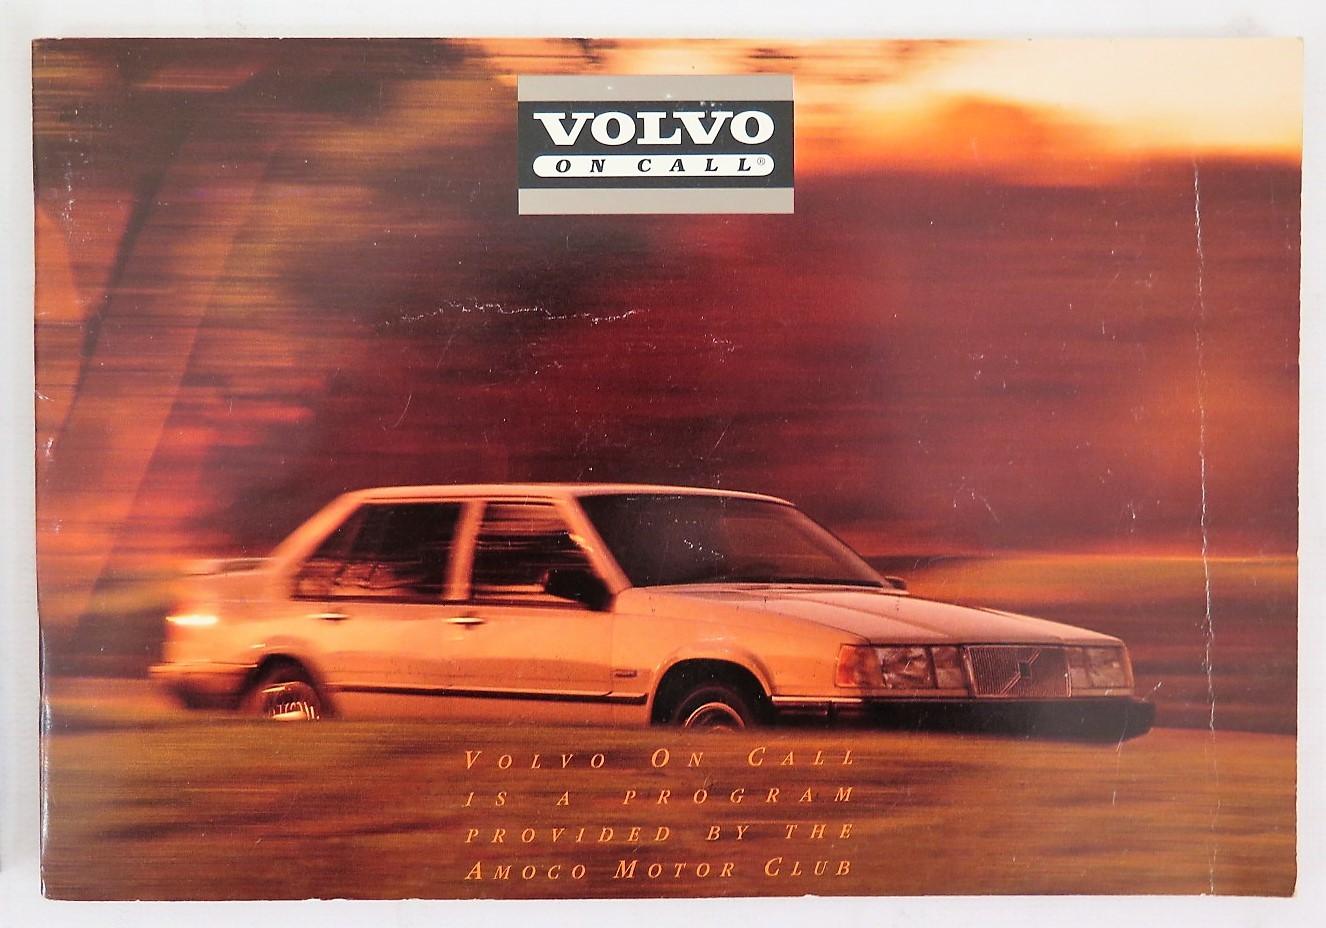 1997 volvo 960 owners manual book bashful yak rh bashfulyak com 1997 volvo s90 owners manual Volvo 960 1997 Interior